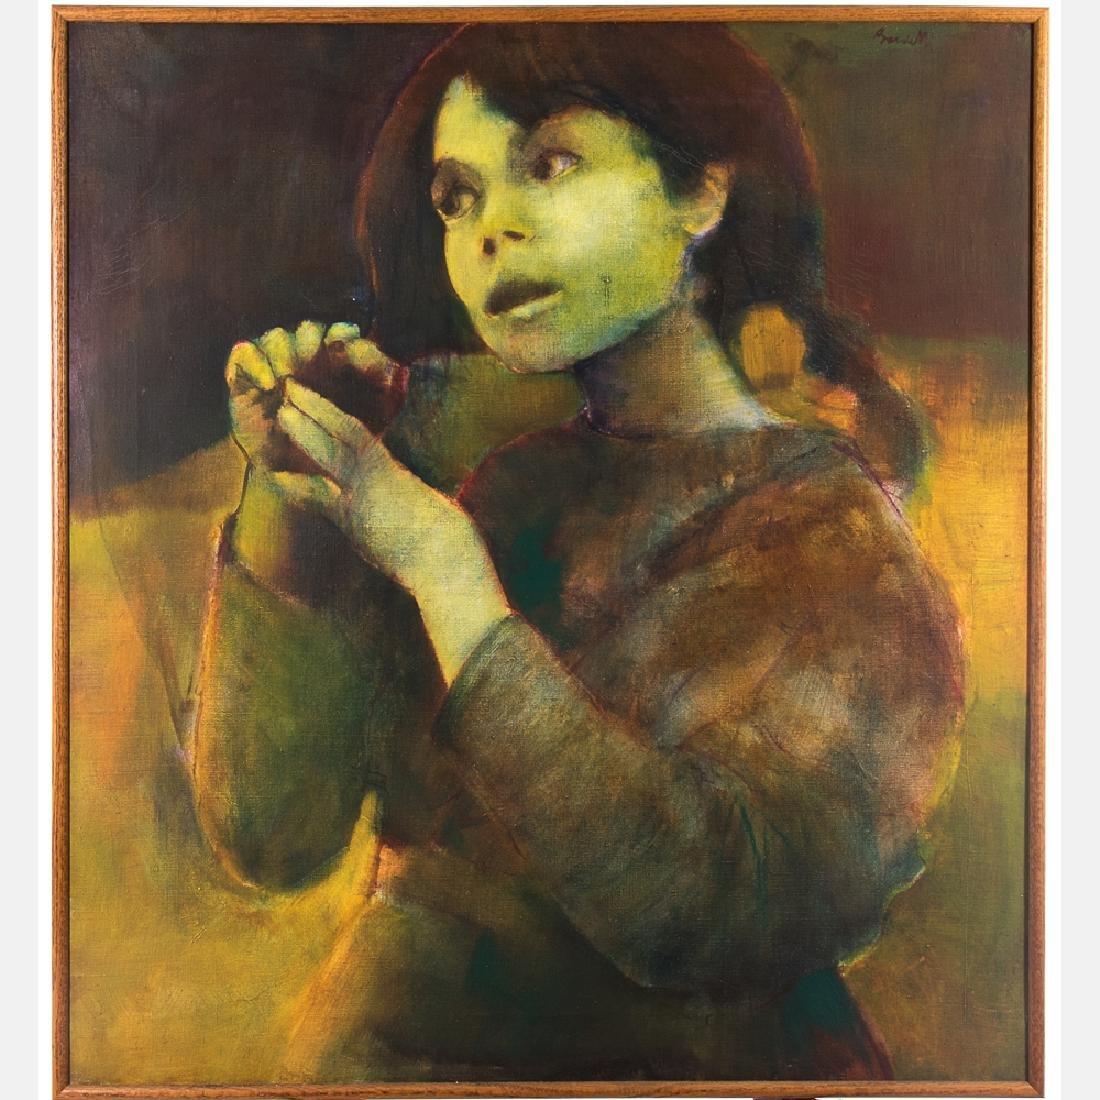 Ademaro Bardelli (b. 1934) Pittura Per Una Bamina, Nov.